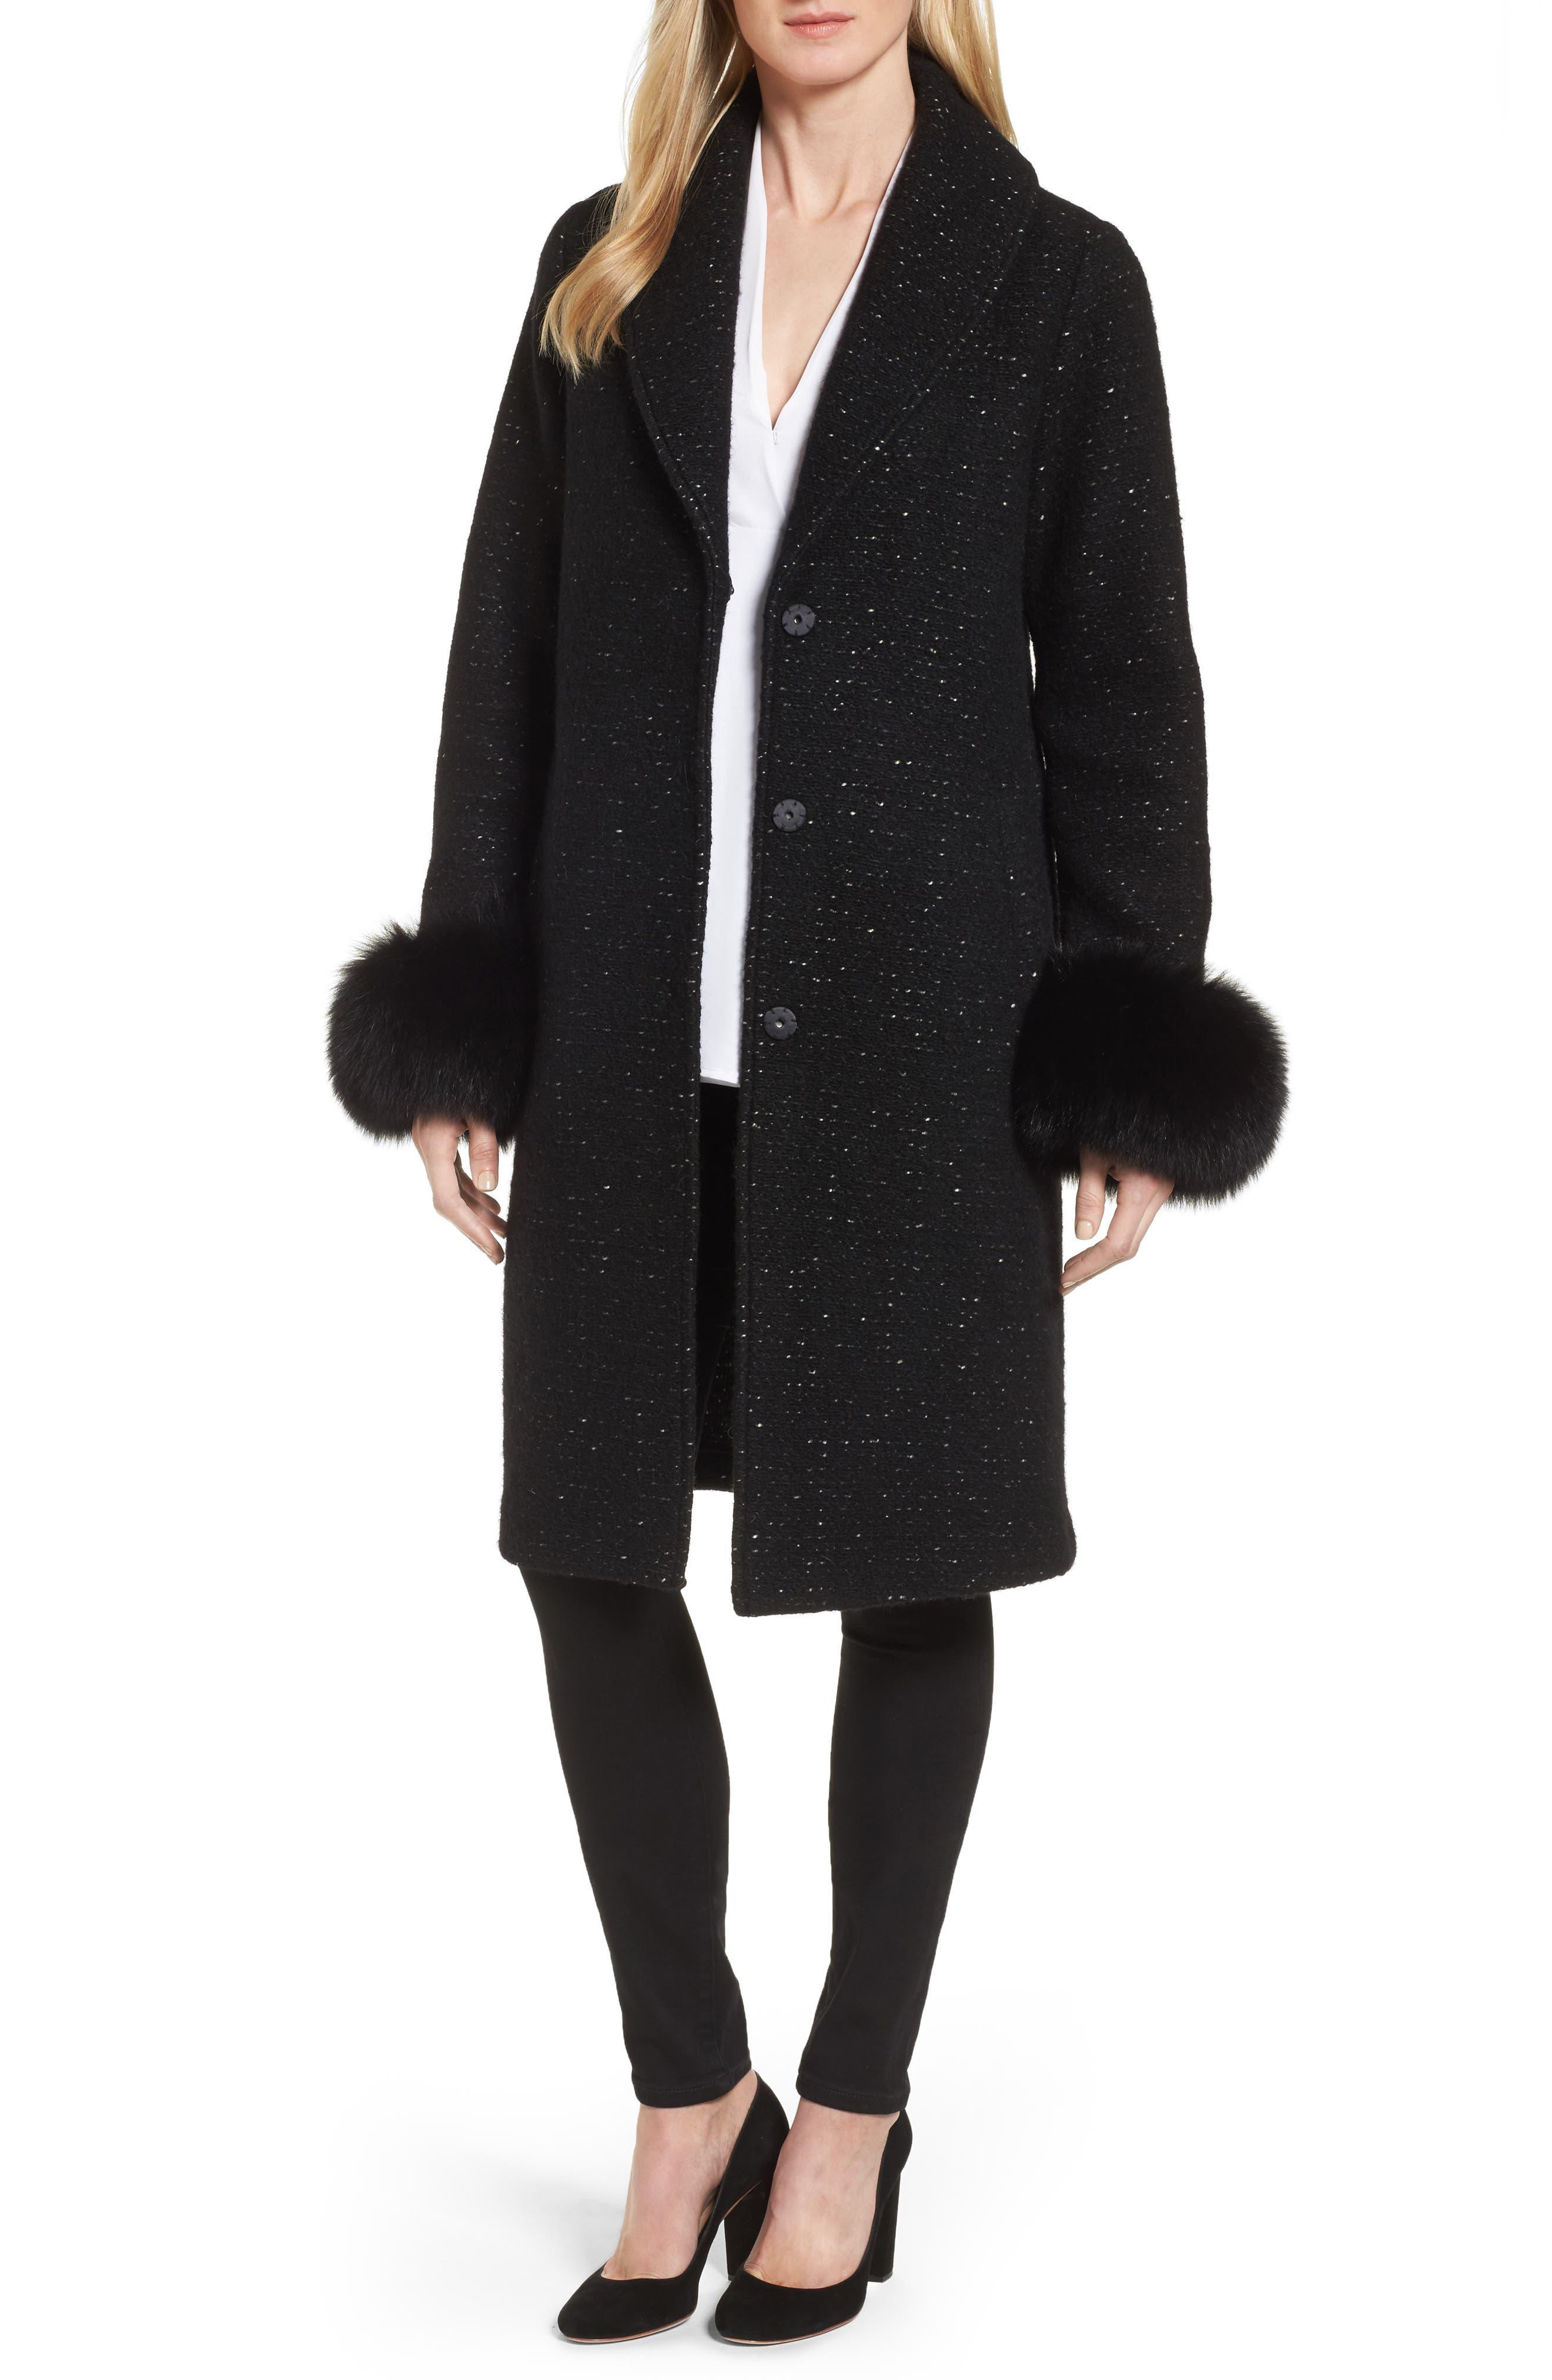 Main Image - Elie Tahari Grace Genuine Fox Fur Trim Knit Wool Blend Long Coat